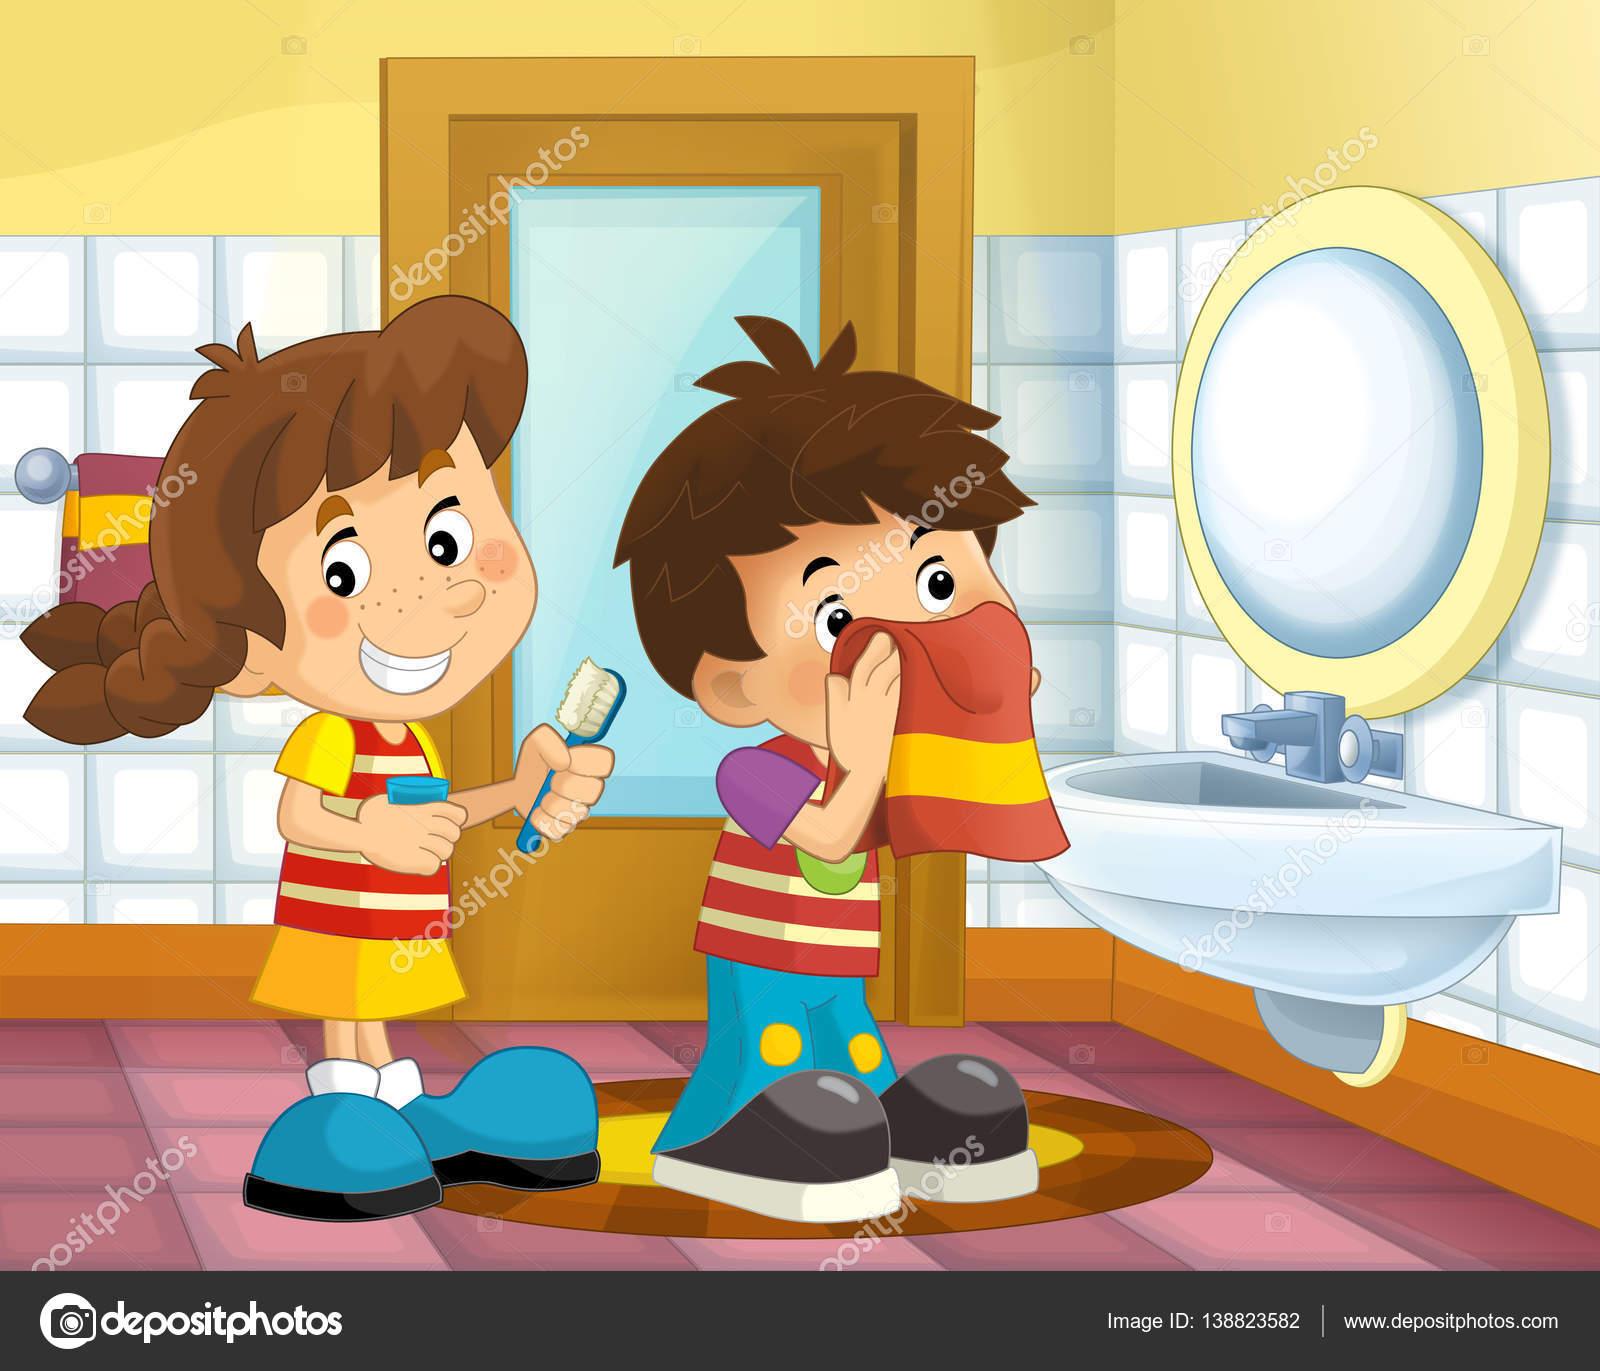 enfants dessin anim dans la salle de bain photographie illustrator hft 138823582. Black Bedroom Furniture Sets. Home Design Ideas